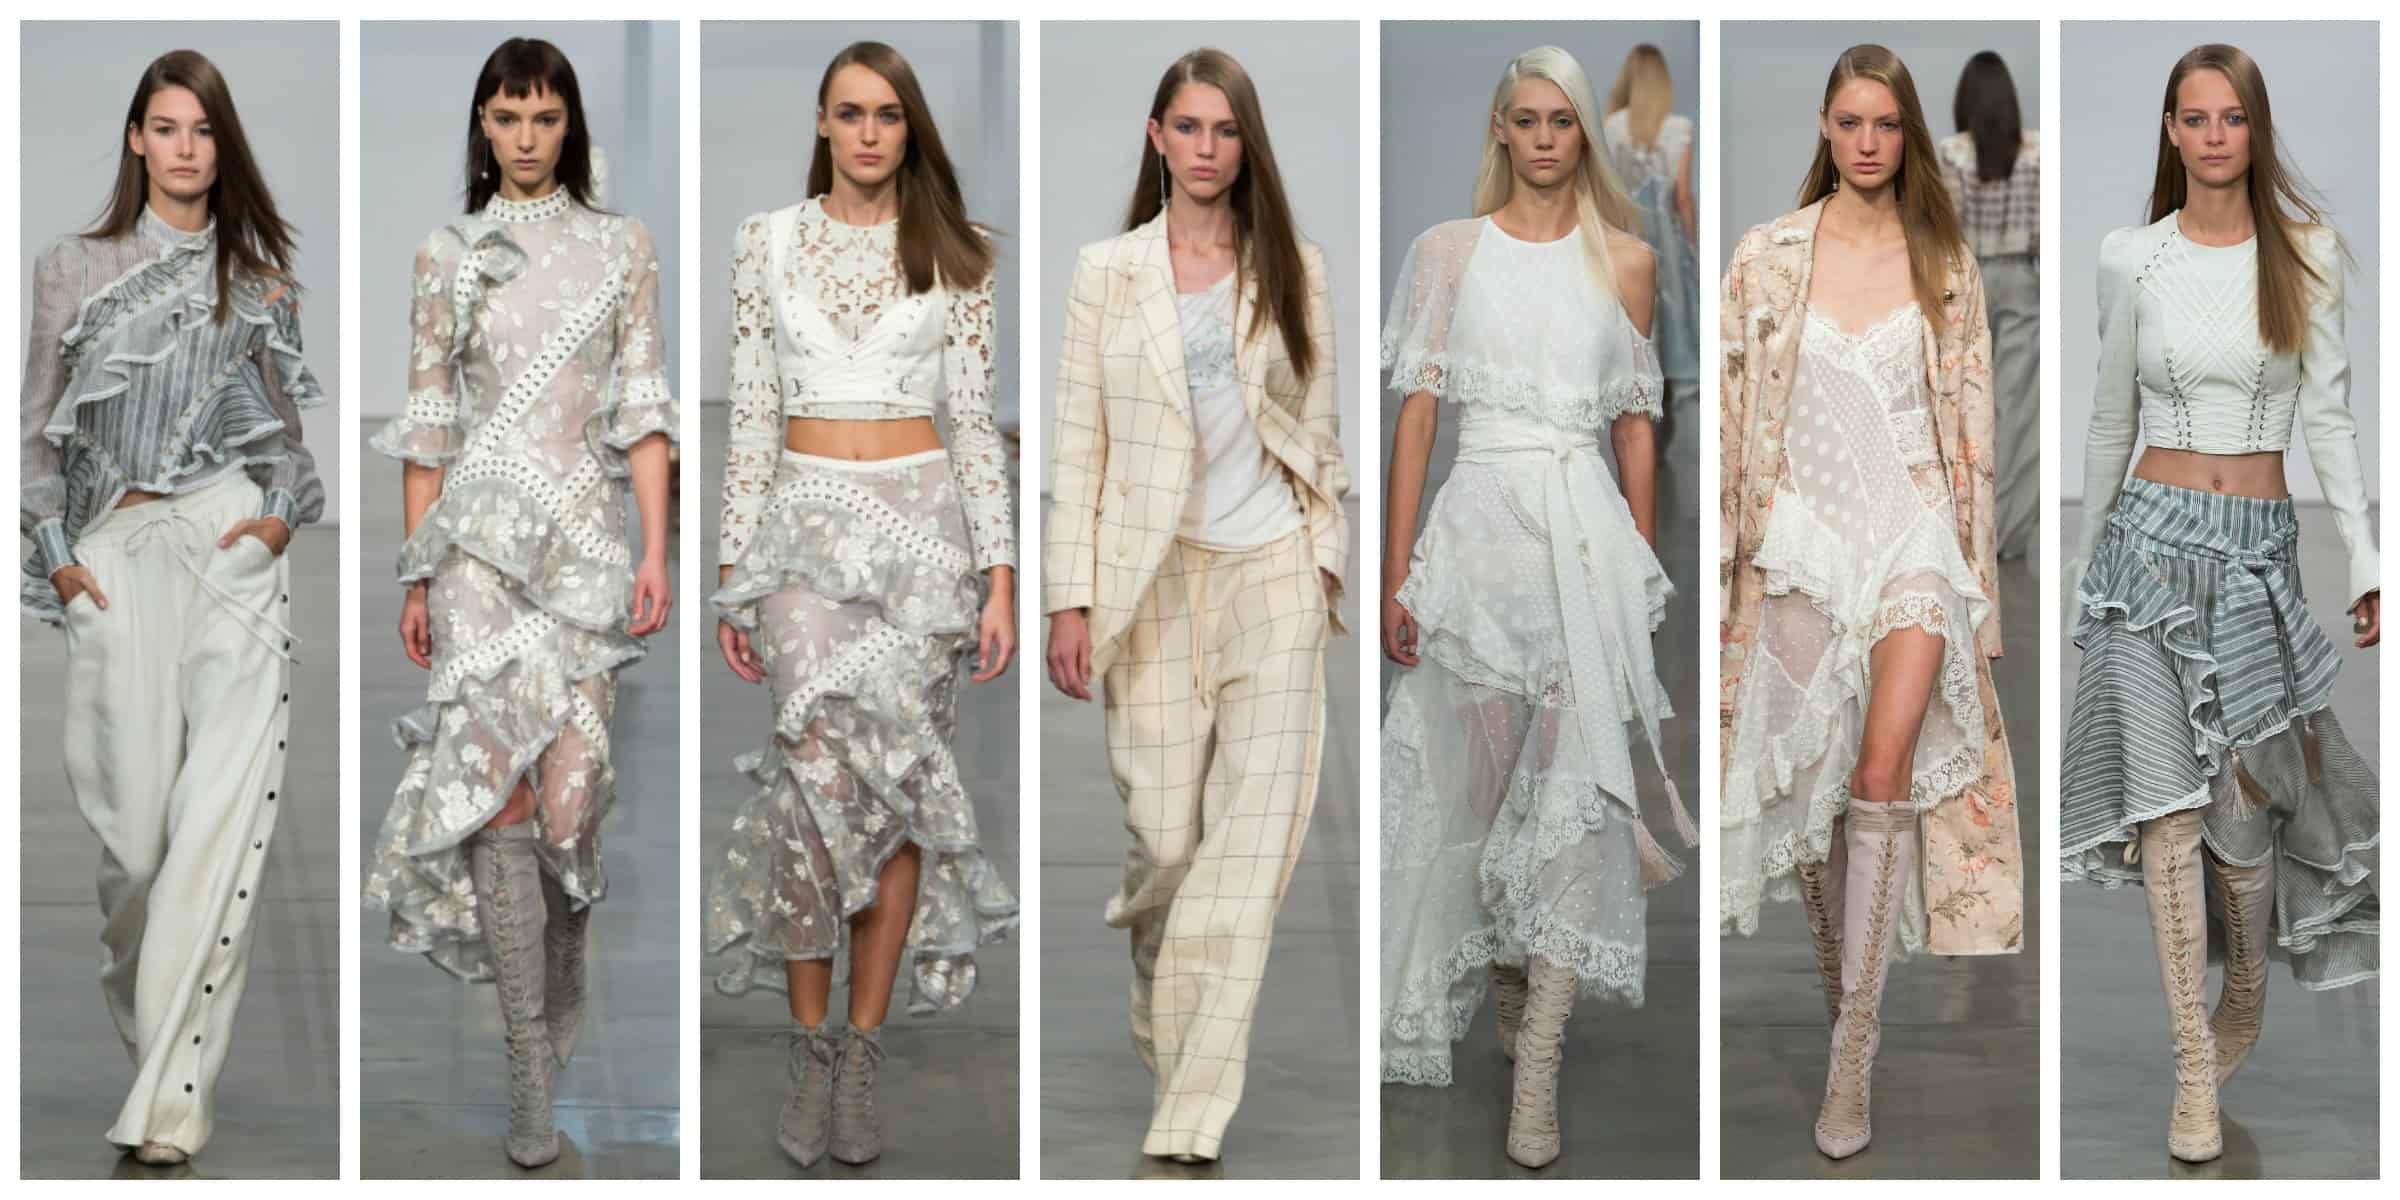 New York Fashion Week Spring 2017 - Zimmerman